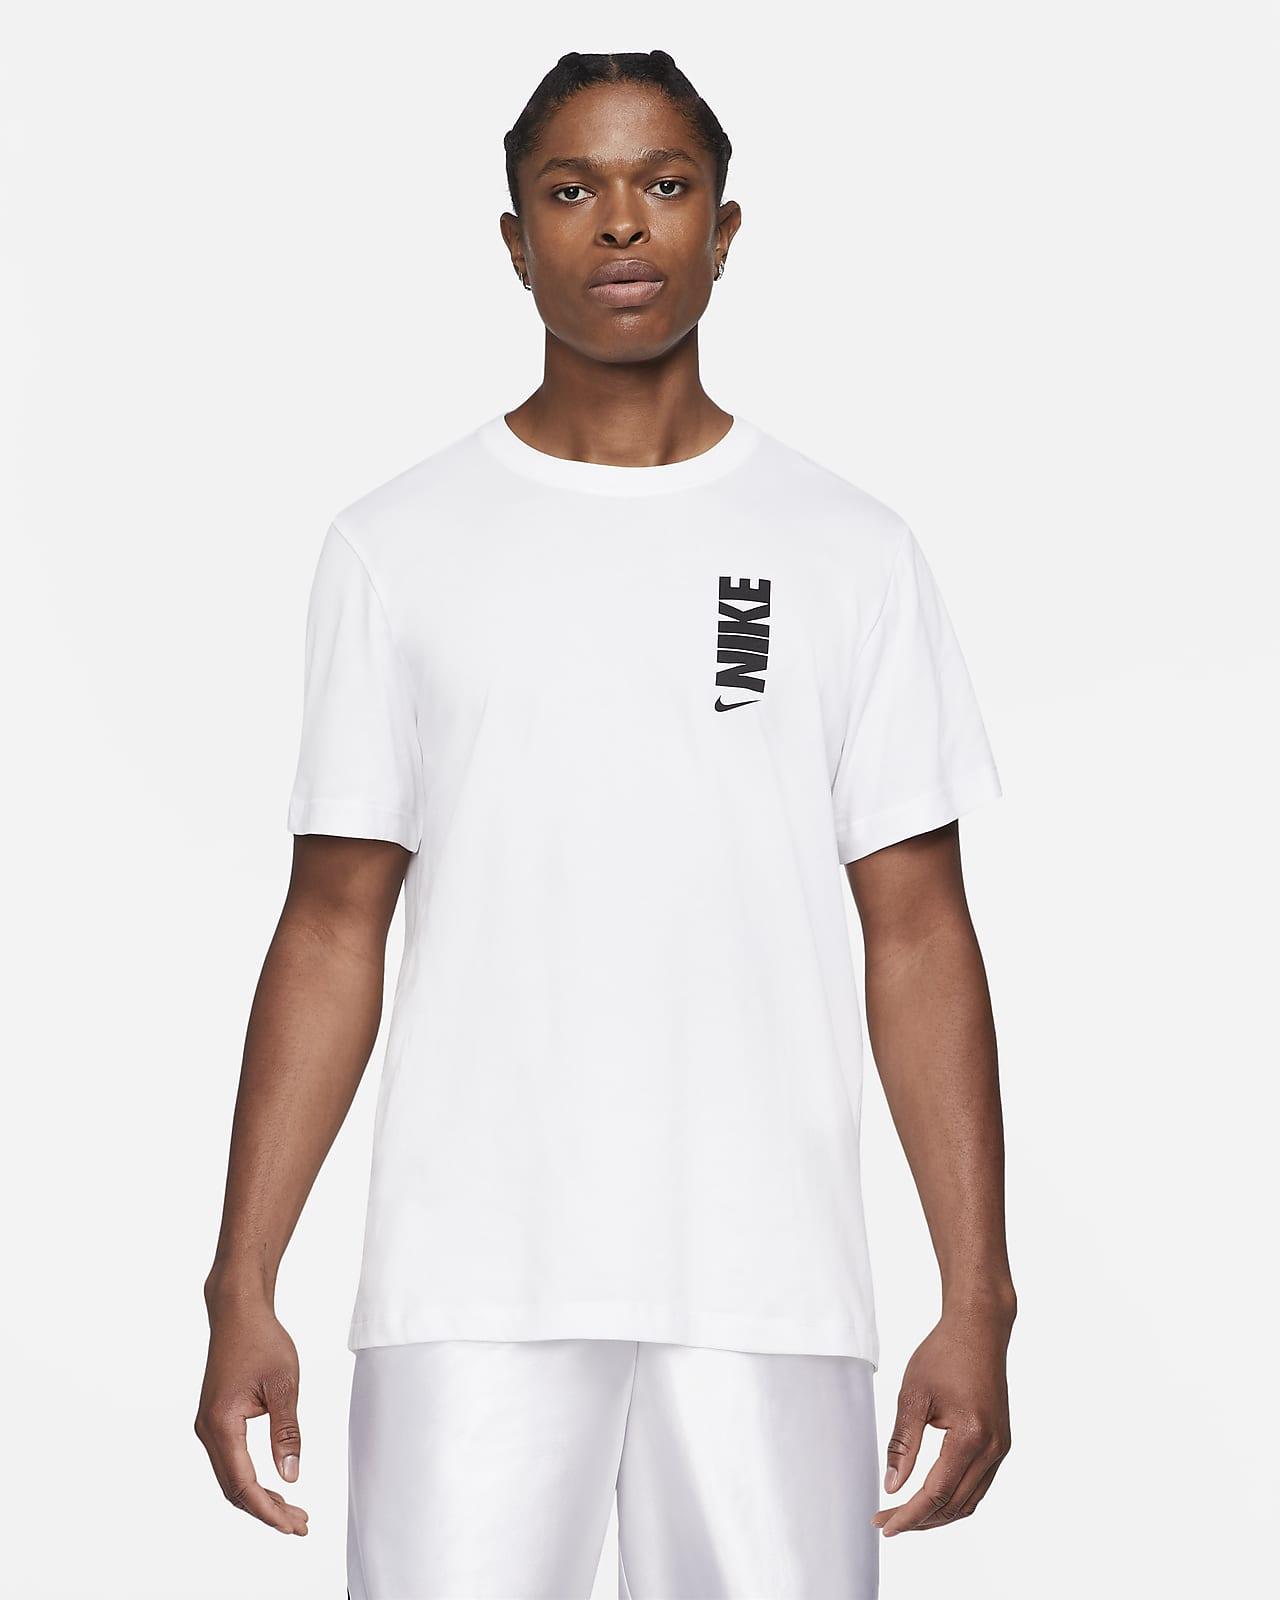 Playera de básquetbol para hombre Nike Dri-FIT Extra Bold